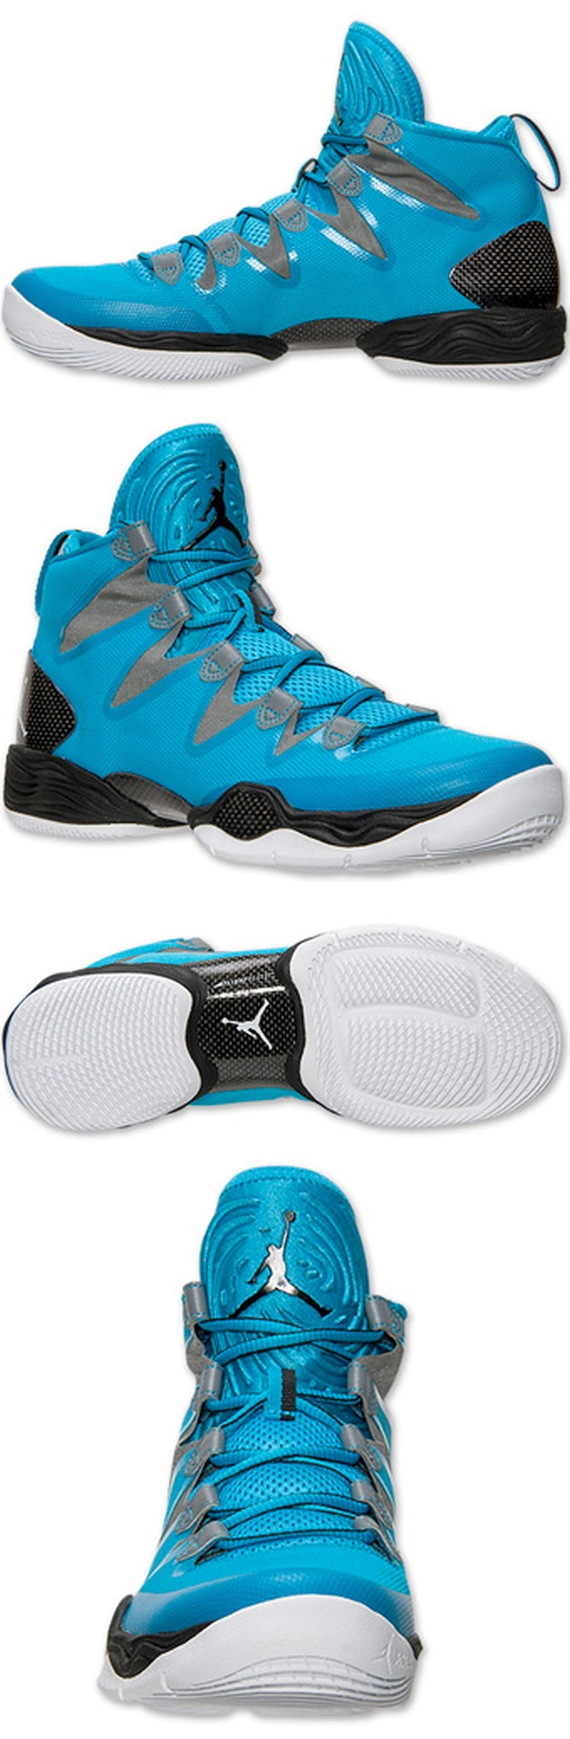 Air Jordan XX8 SE Dark Powder Blue Release Date